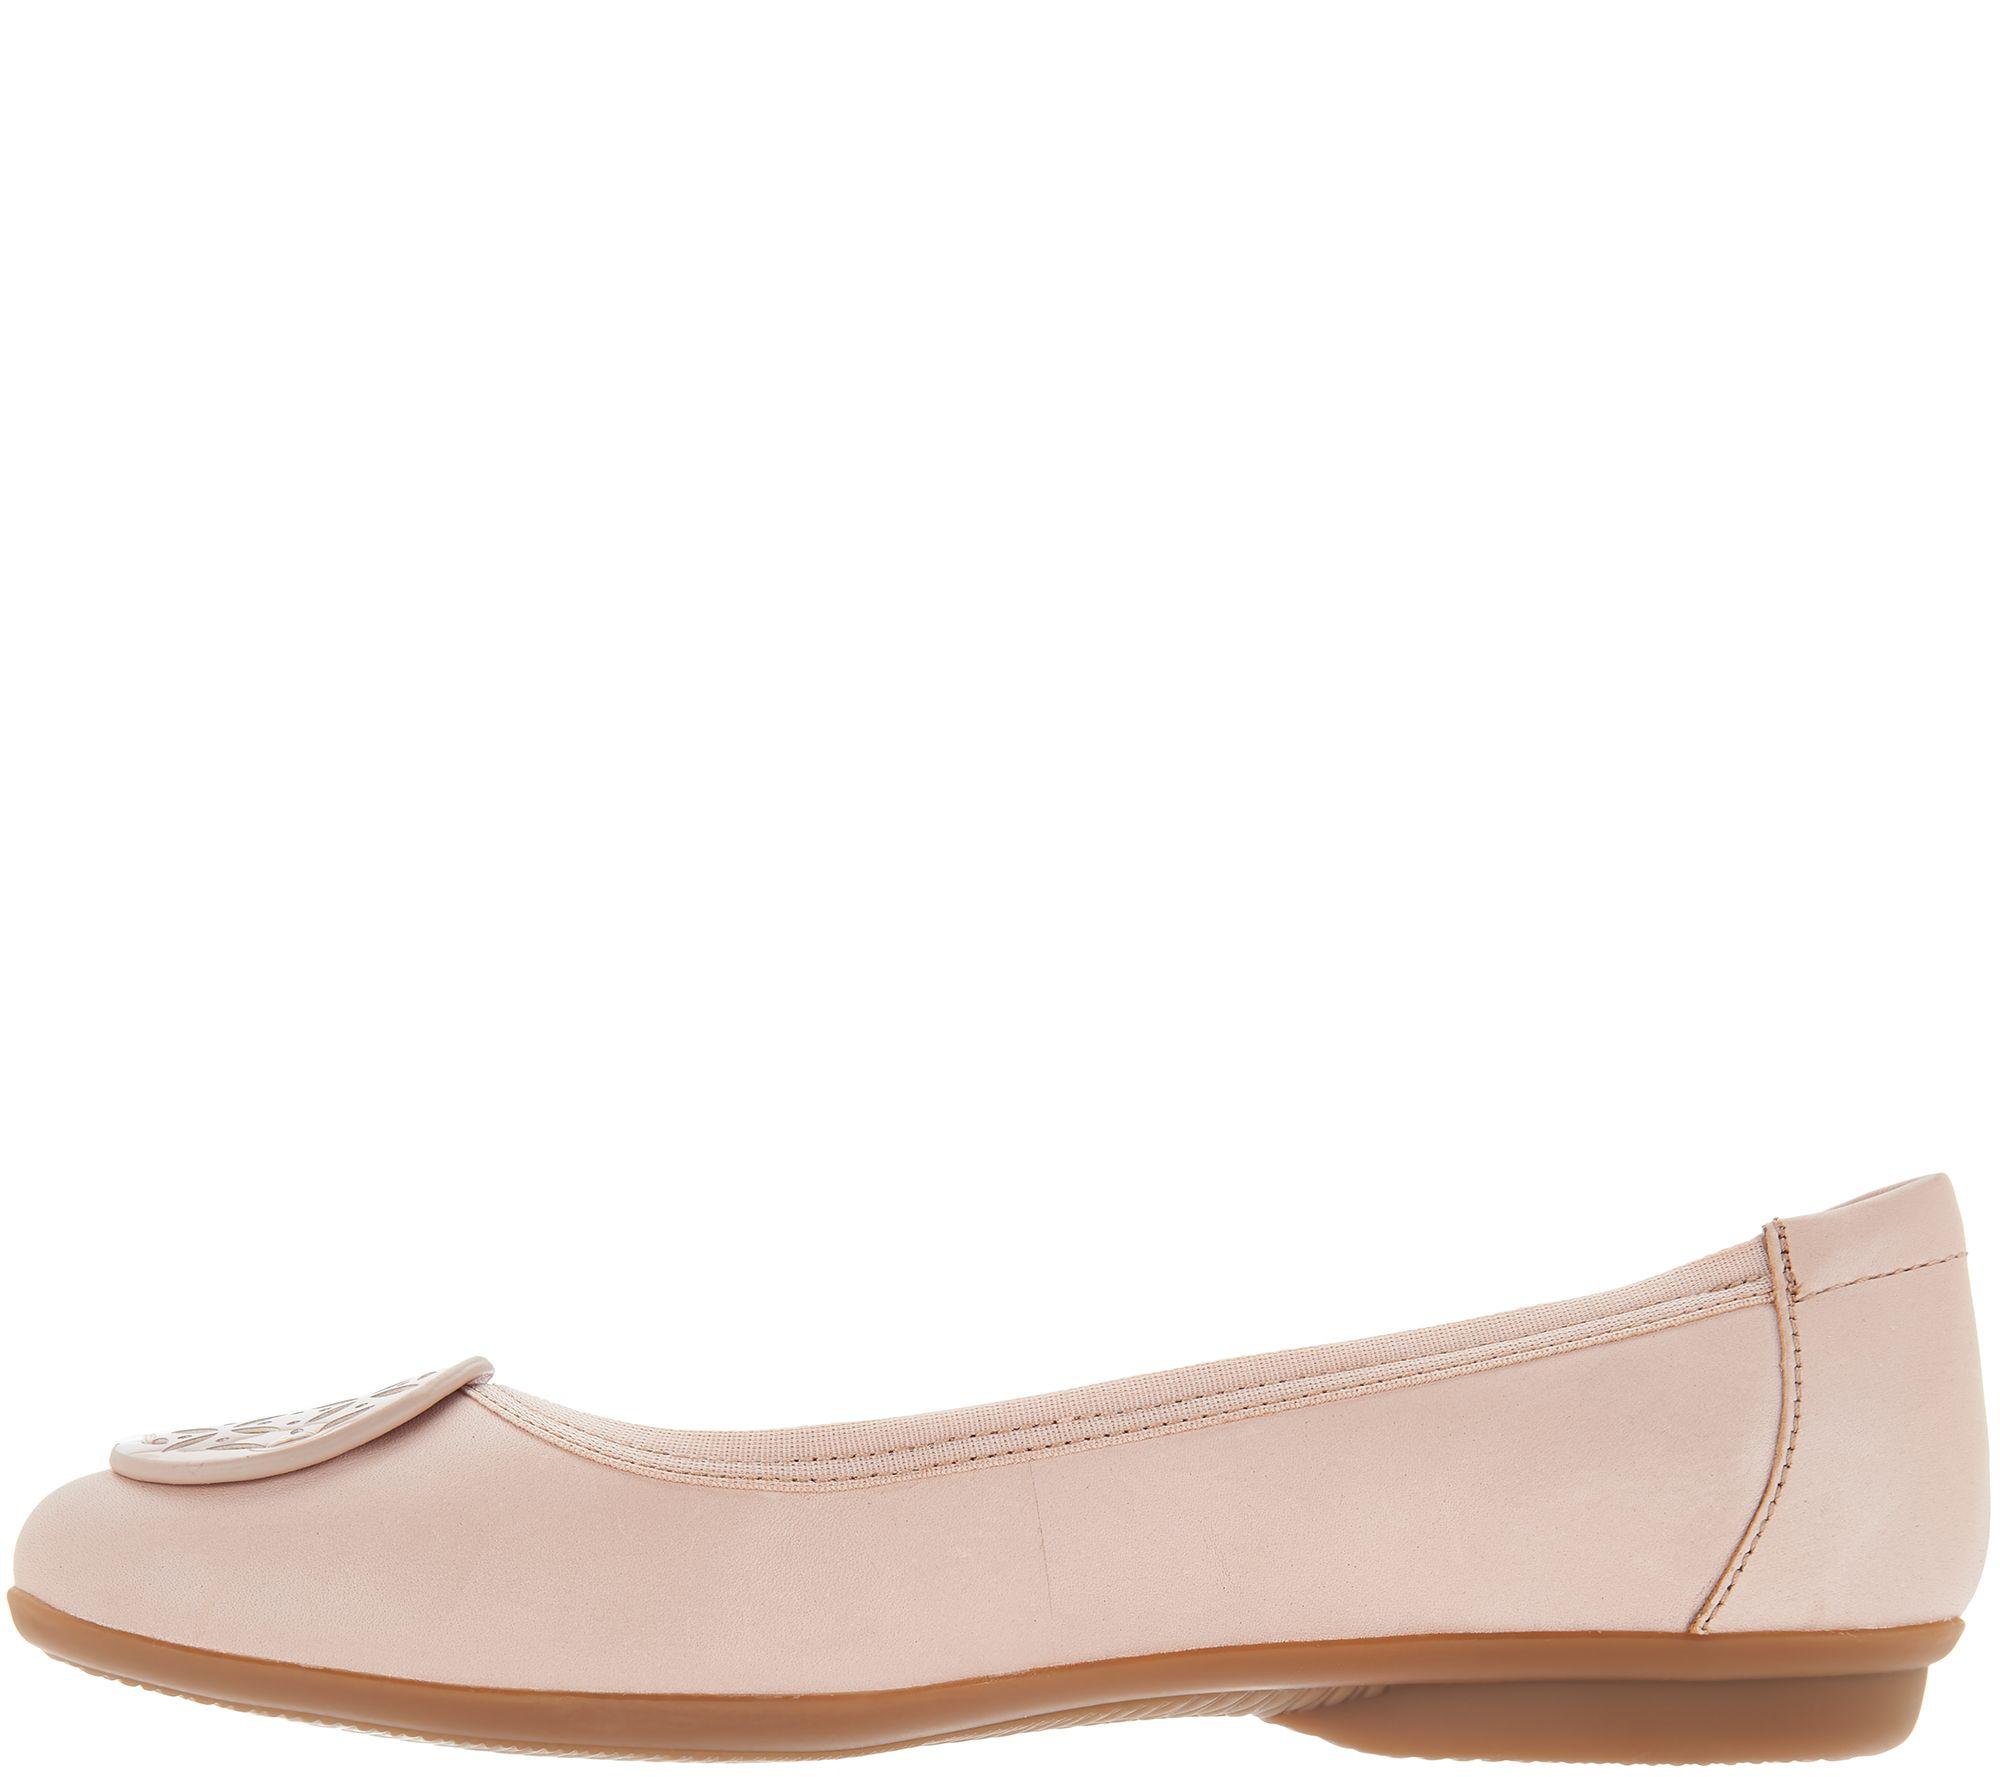 9ecb7b77637 Clarks Leather Medallion Comfort Ballet Flats - Gracelin Lola - Page 1 —  QVC.com